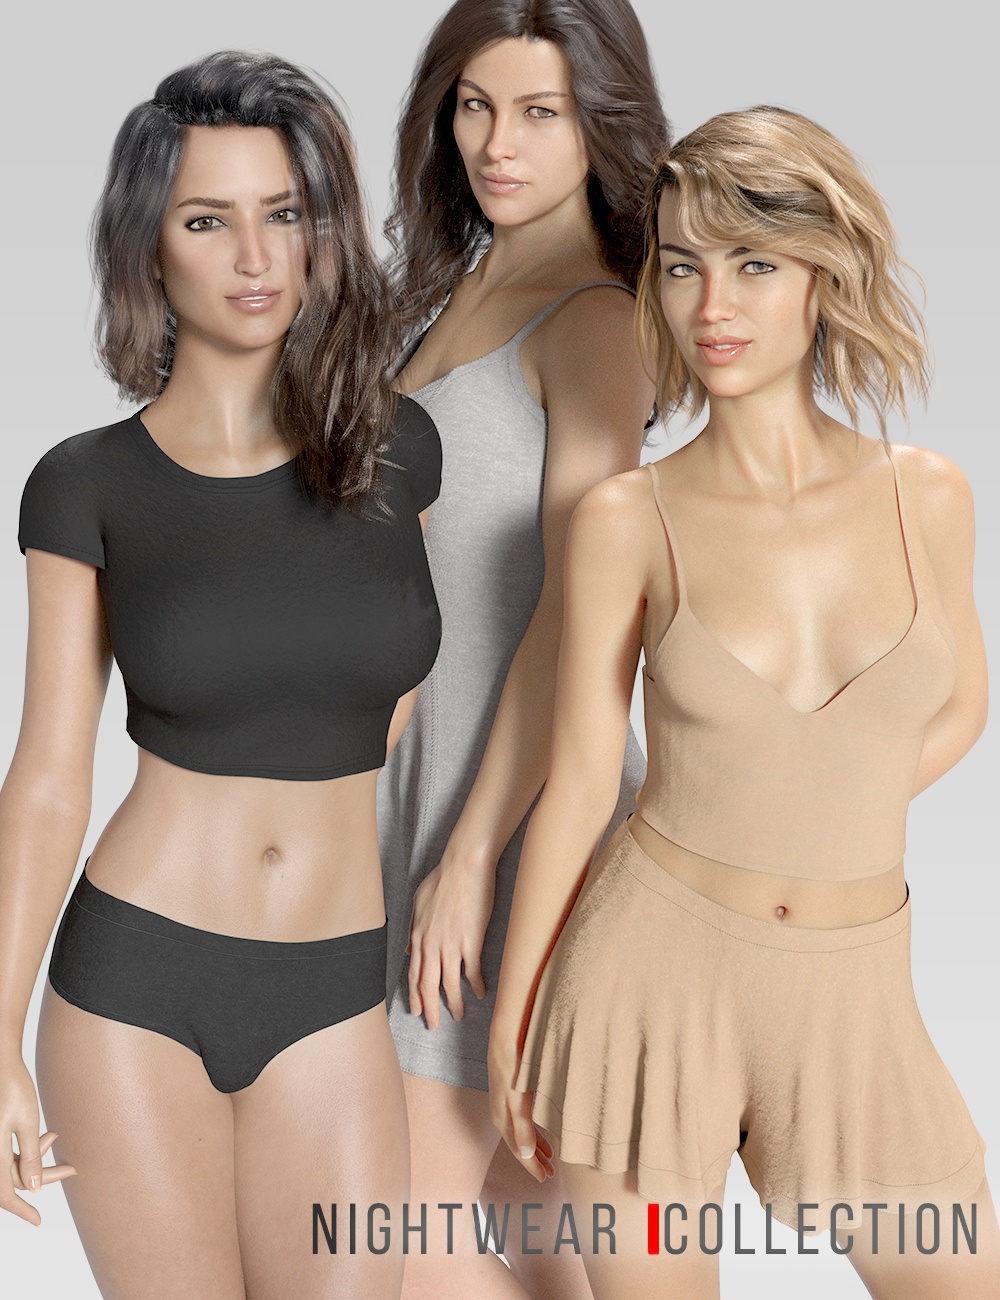 dForce Sterling's Nightwear Collection by: Lyoness, 3D Models by Daz 3D